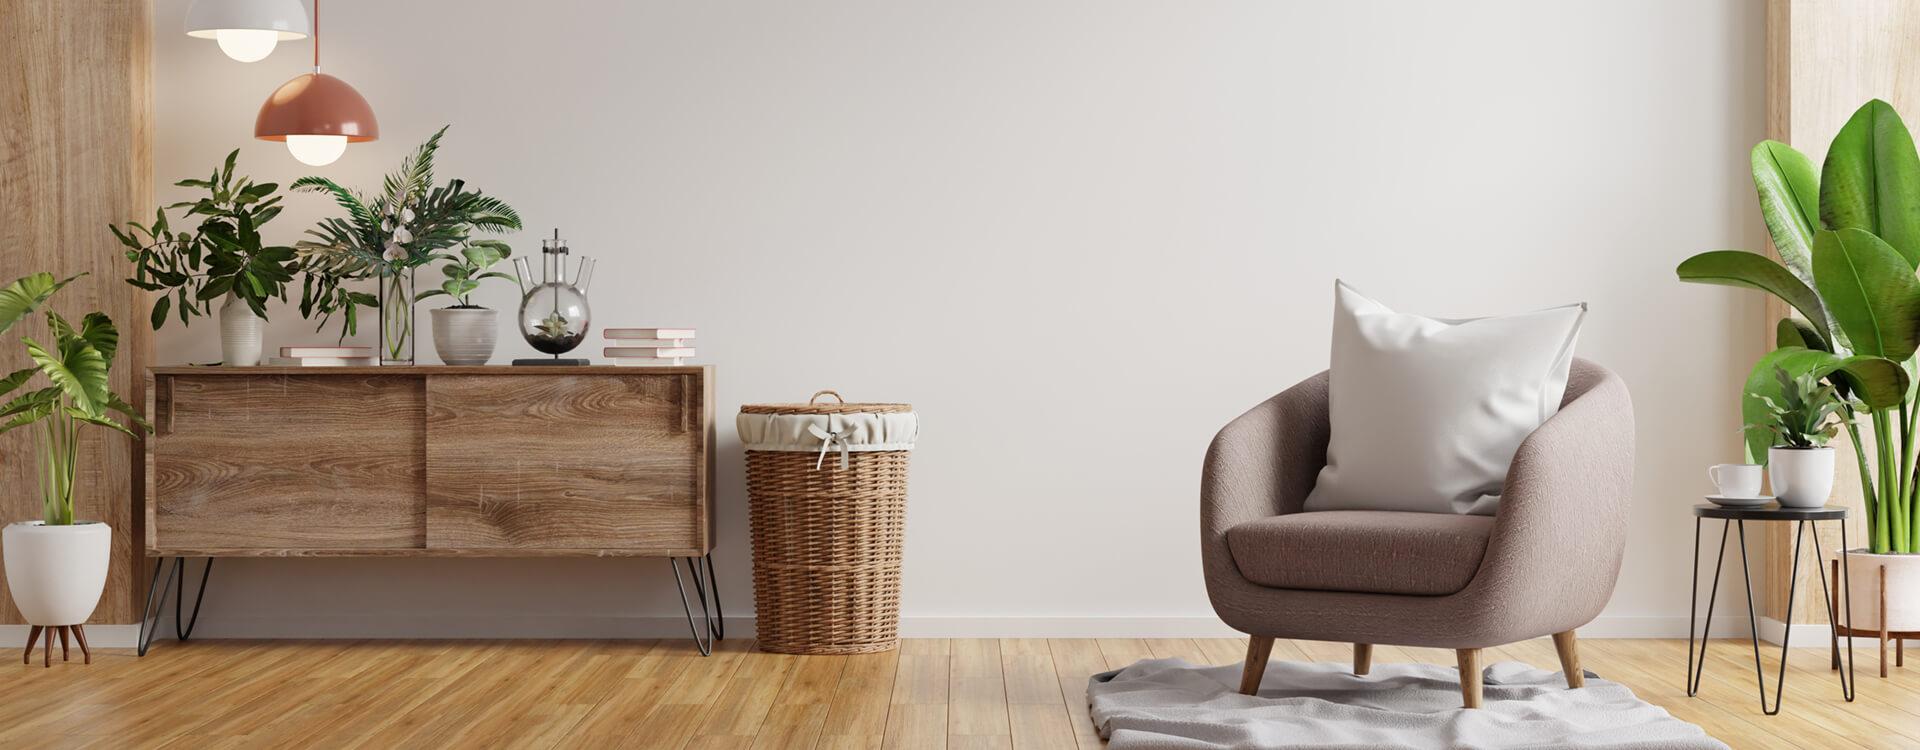 imotta - Immobilien bewegen - Logo